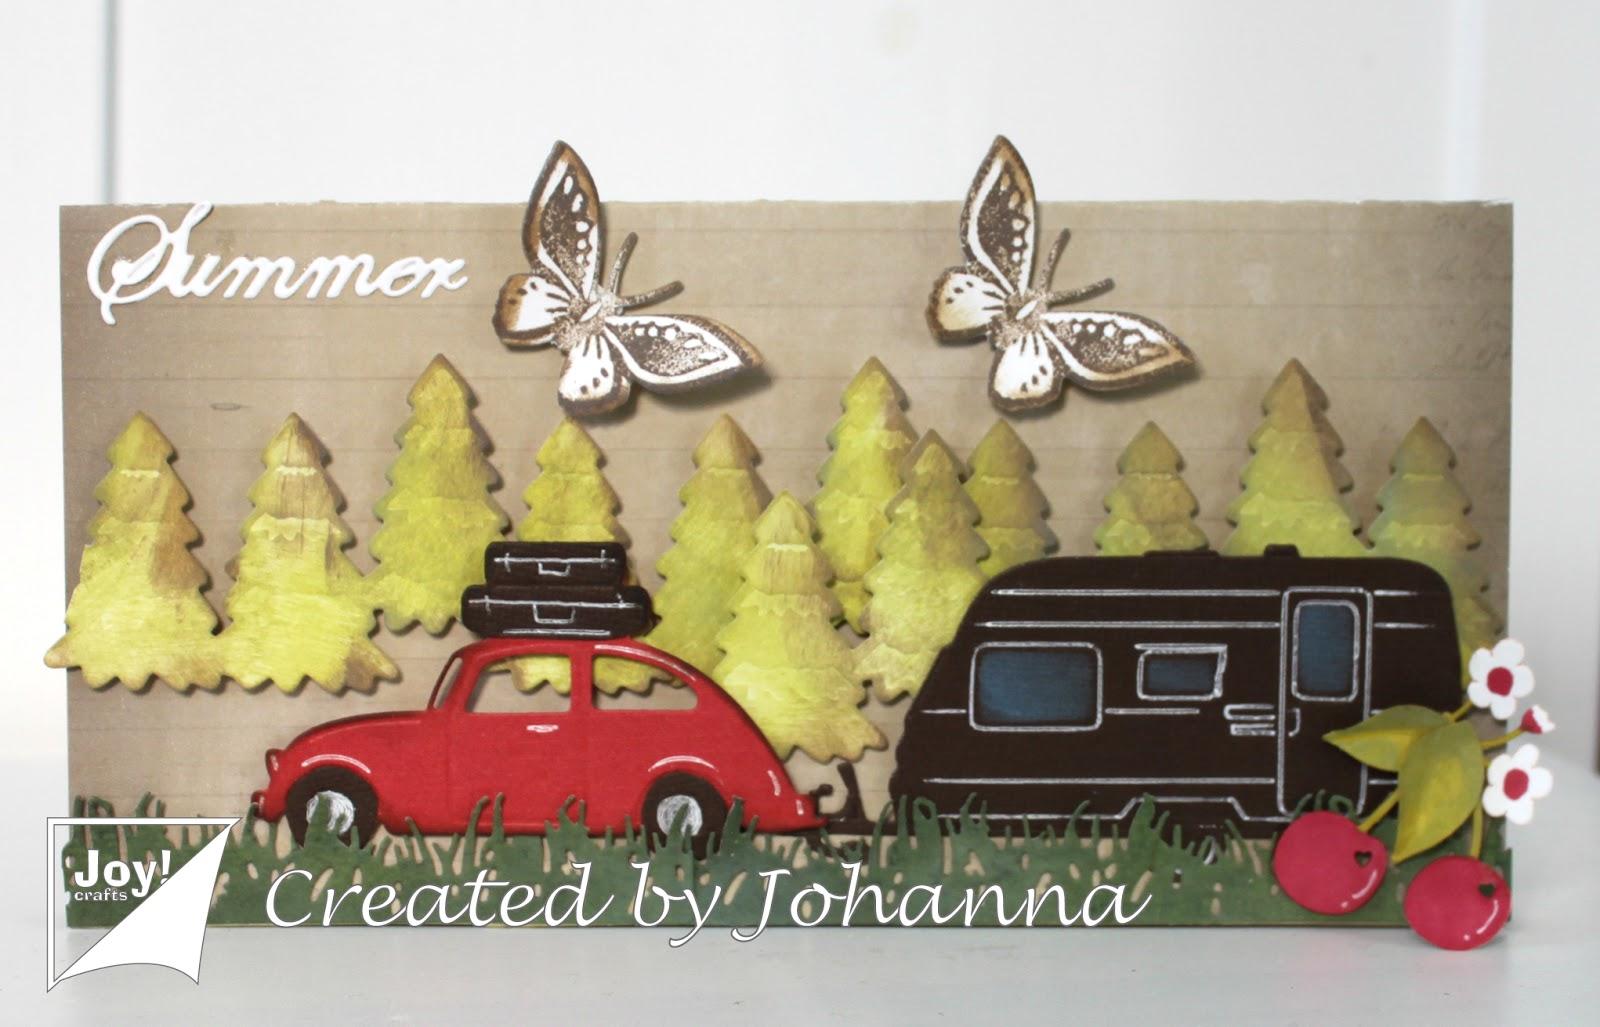 6002-0677/Joy! Crafts/ジョイ・クラフツ/ダイ(抜型)/3D - Car VW with suitcases 車 VW スーツケース 旅行